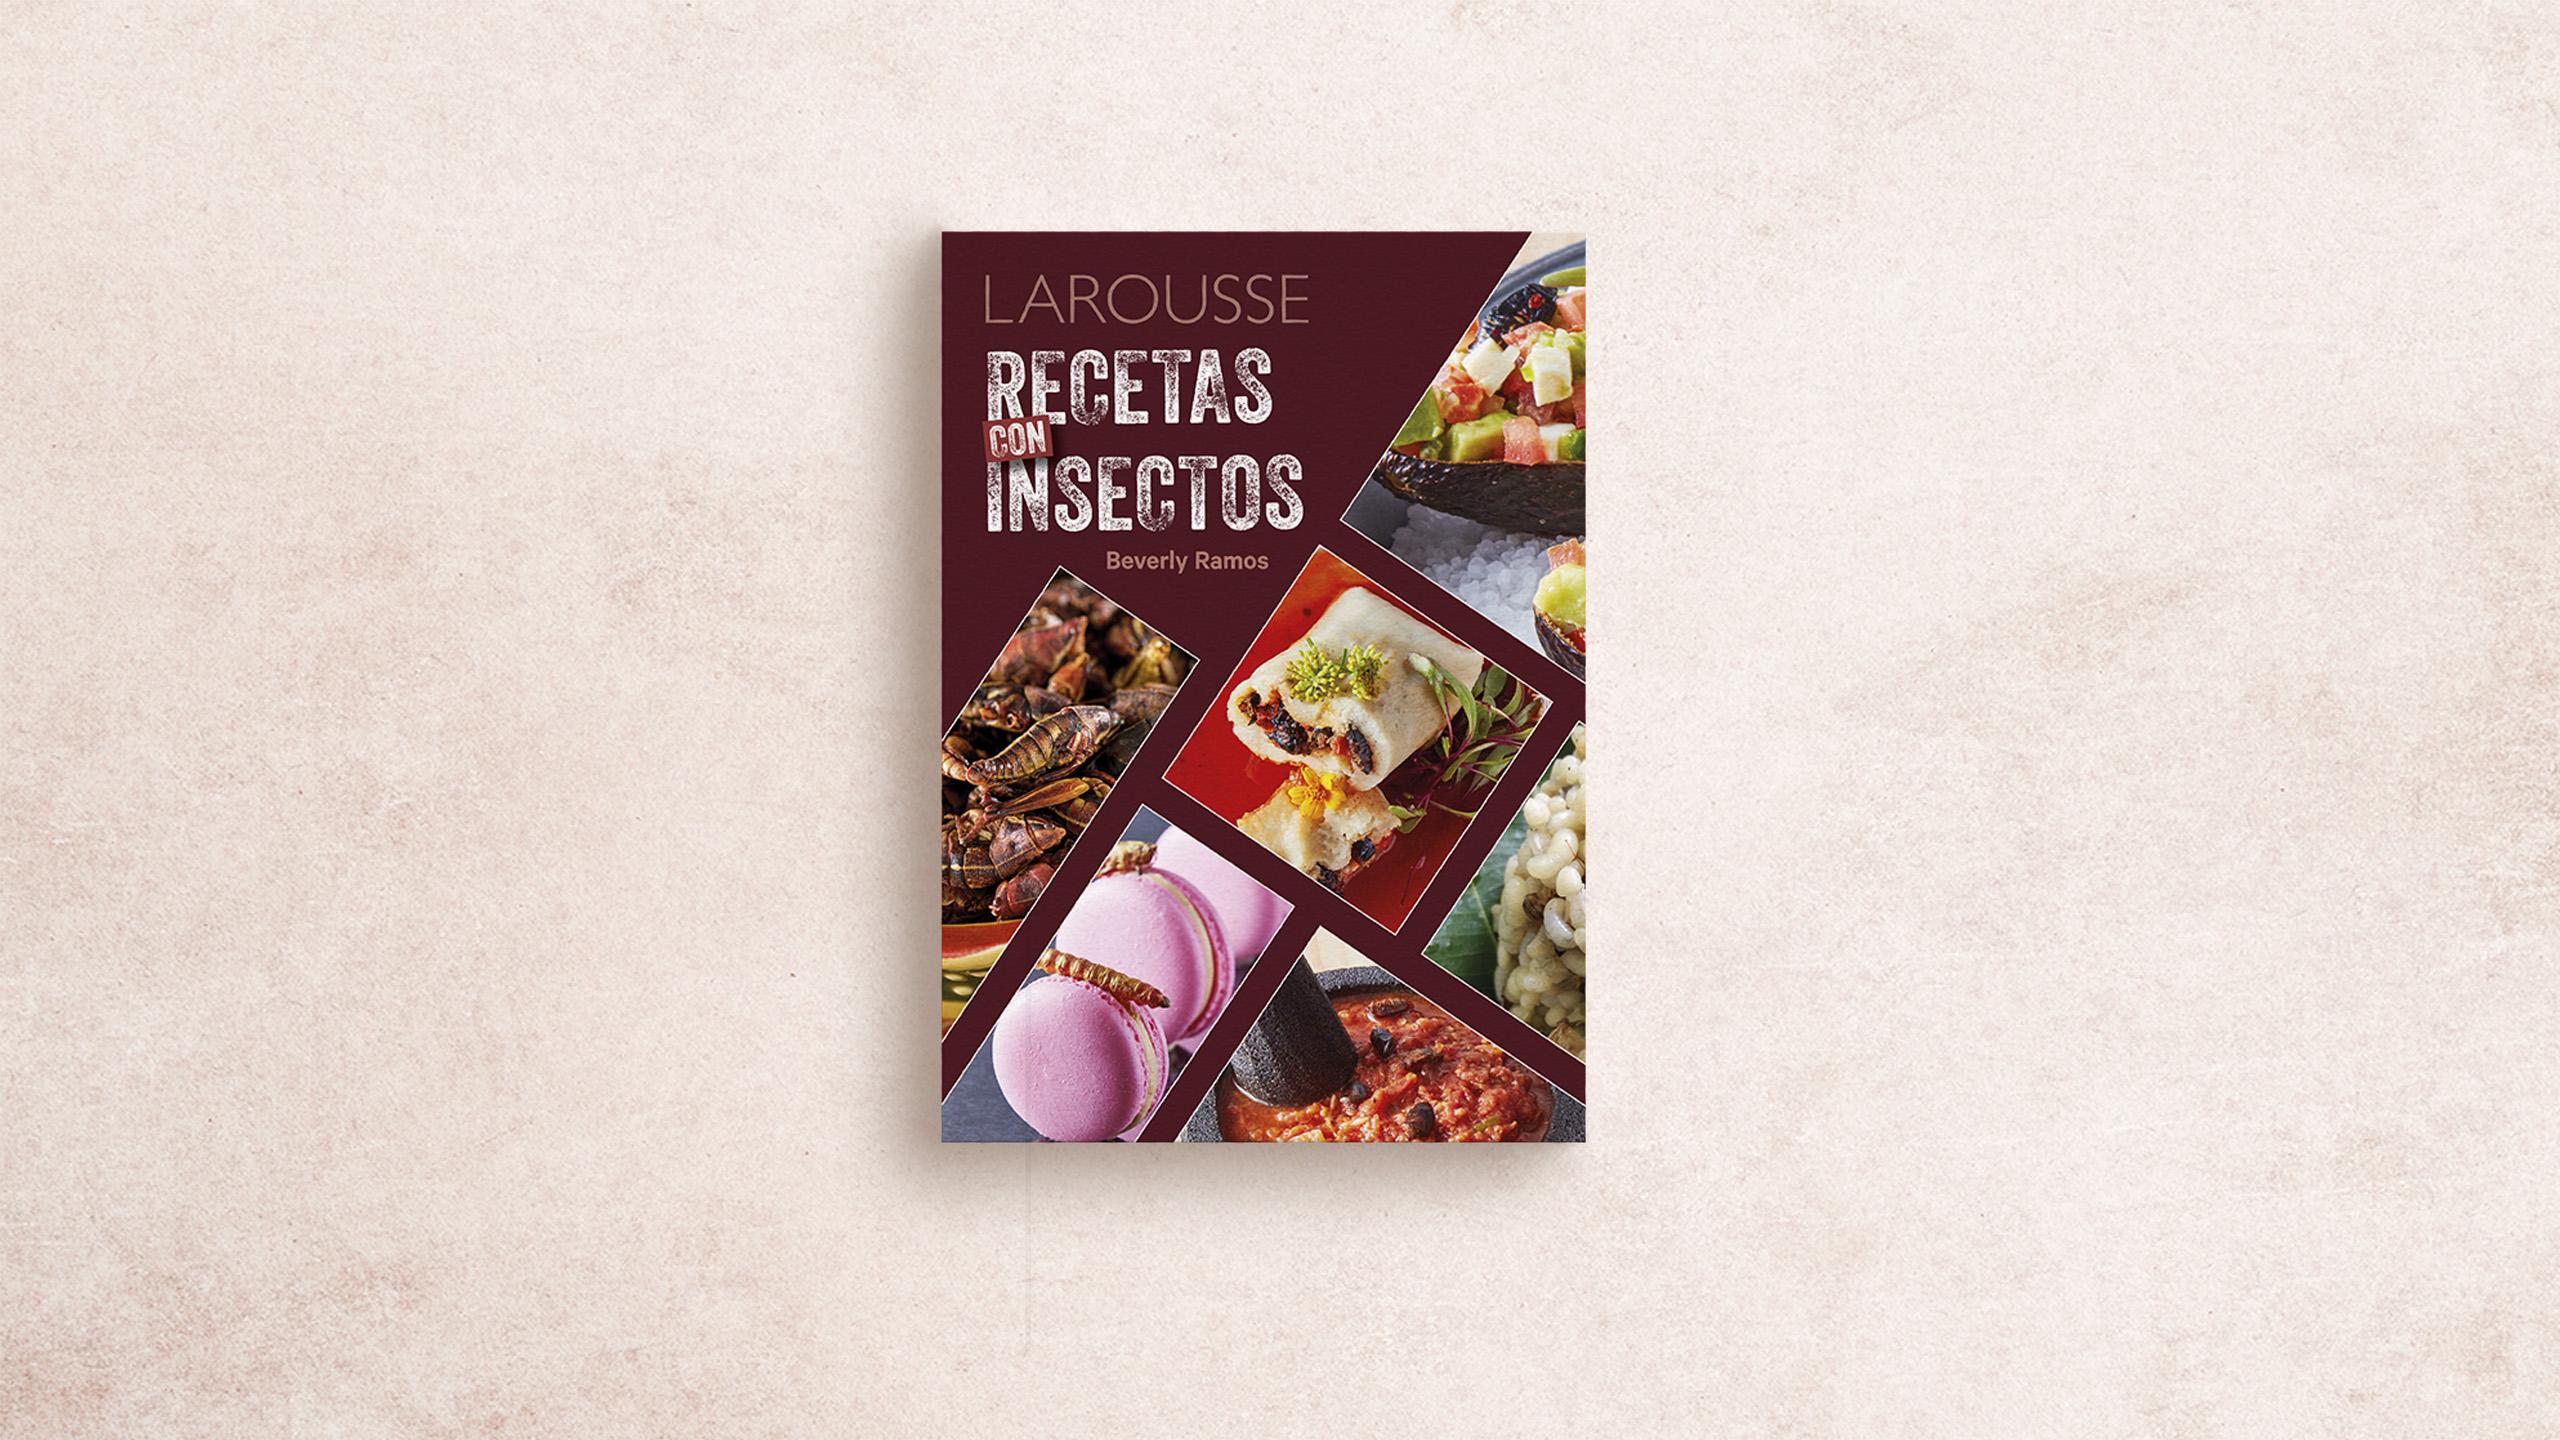 libro-larousse-recetas-insectos